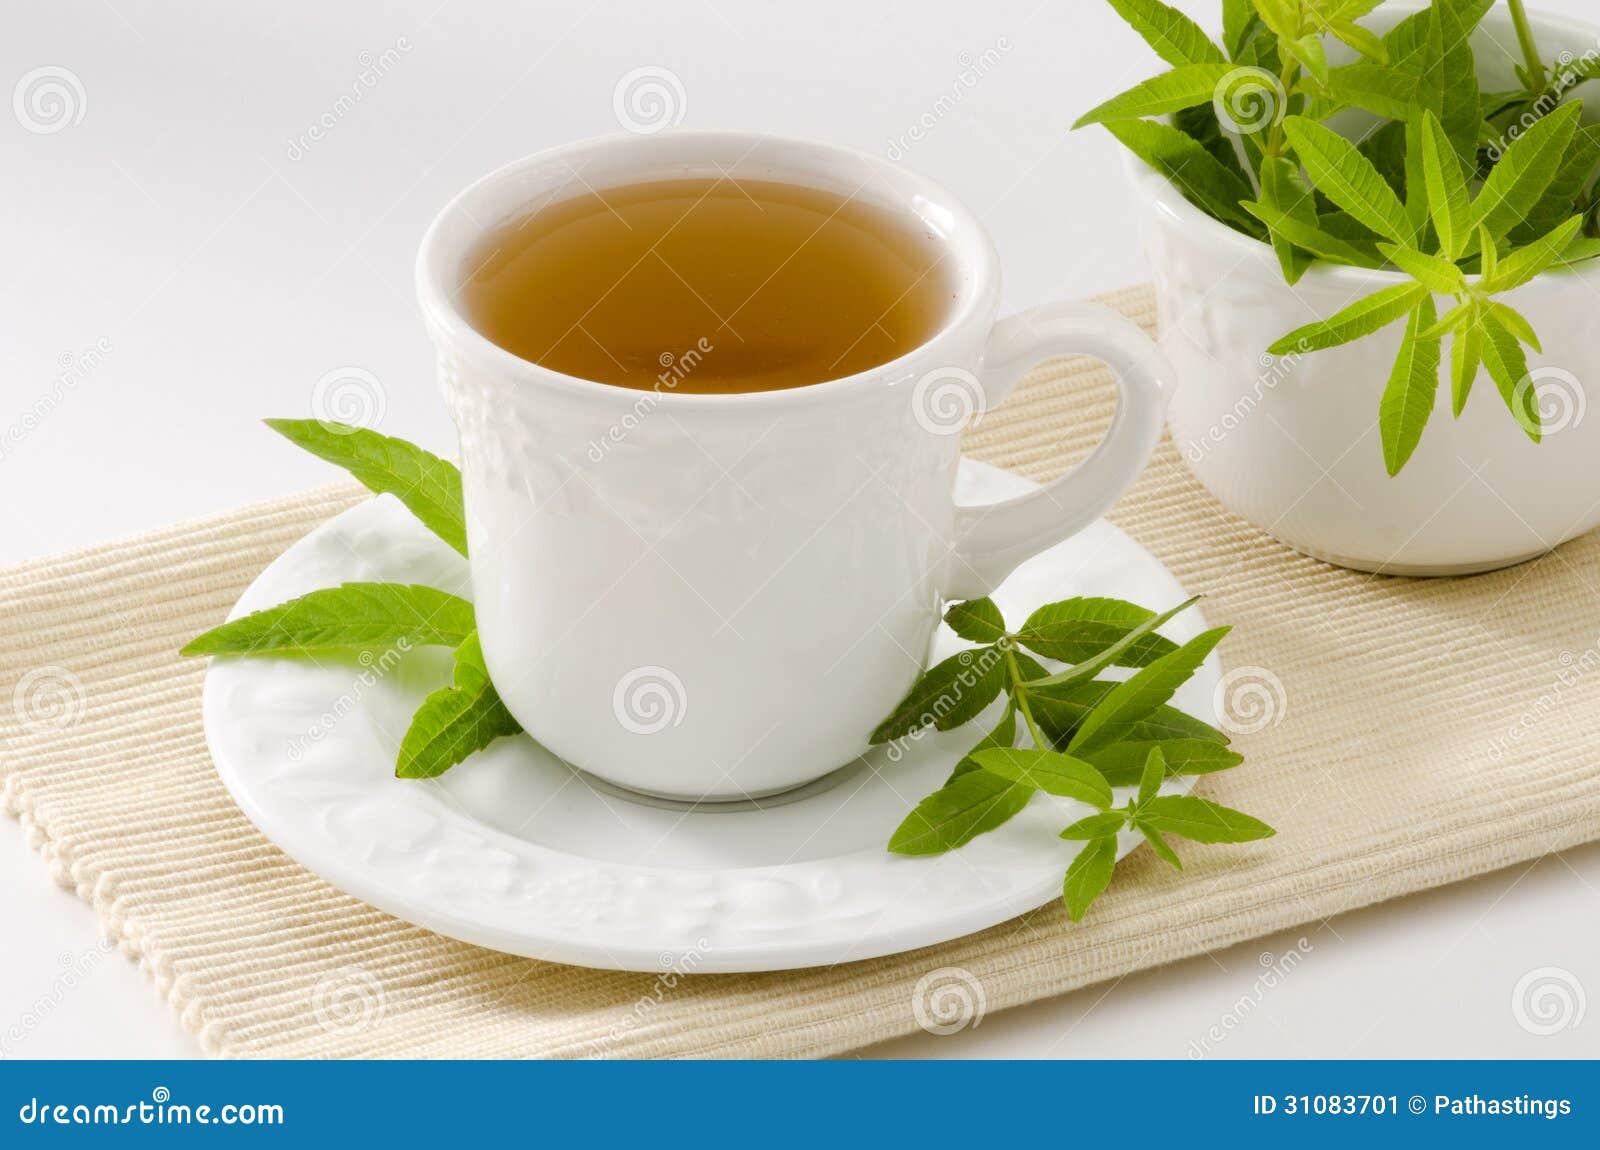 Lemon verbena Herbal Tea in a cup. Aloysia citriodora. Naturopathy ...